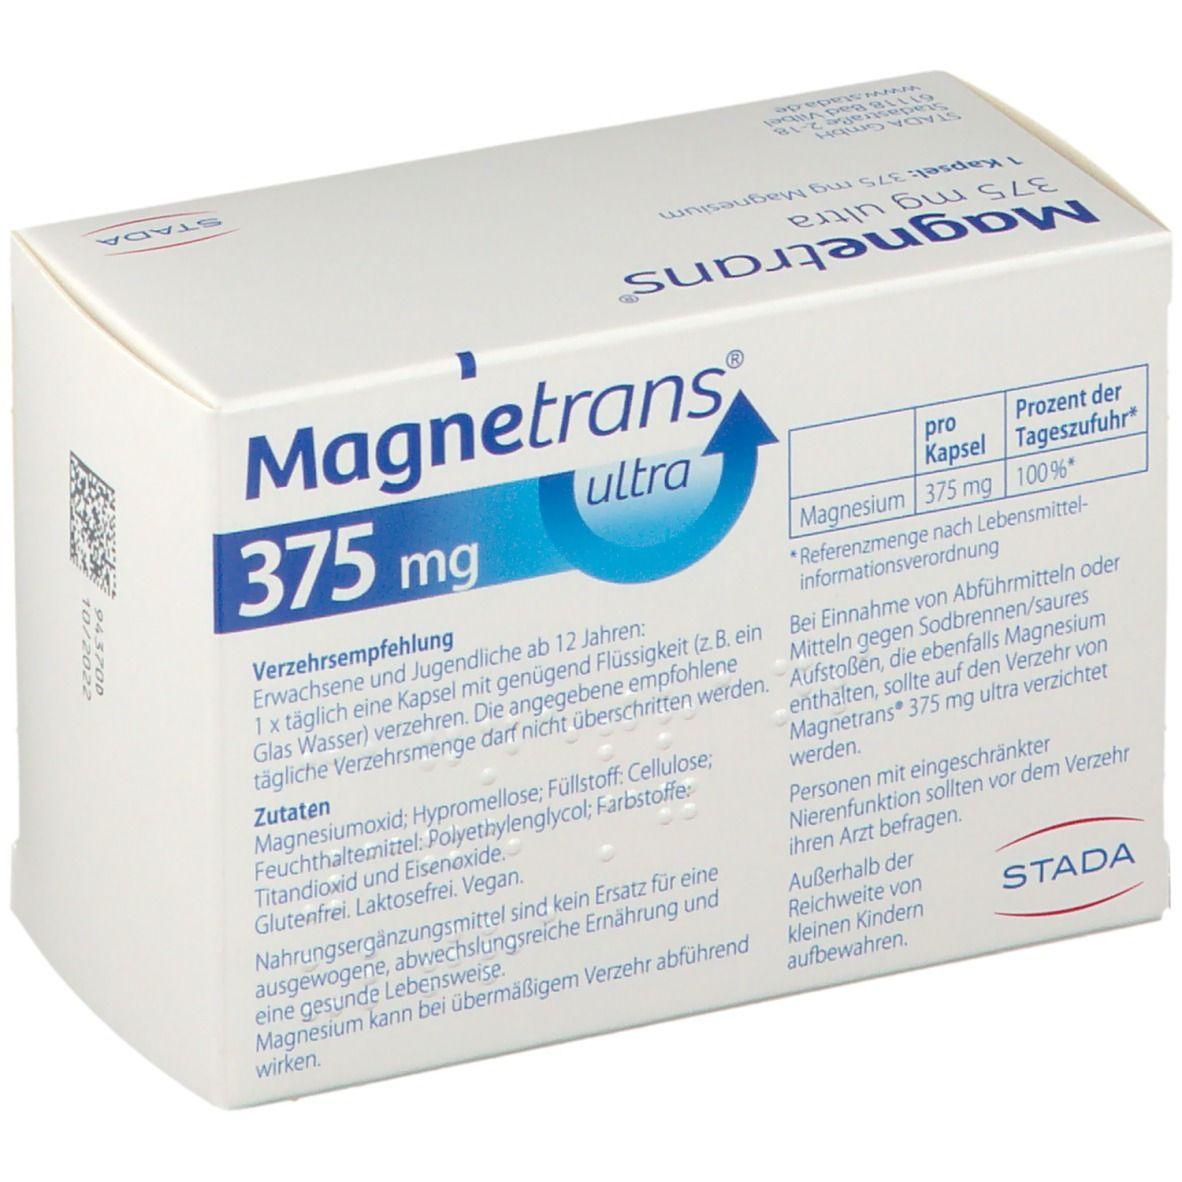 Magnetrans® ultra Kapseln 375 mg